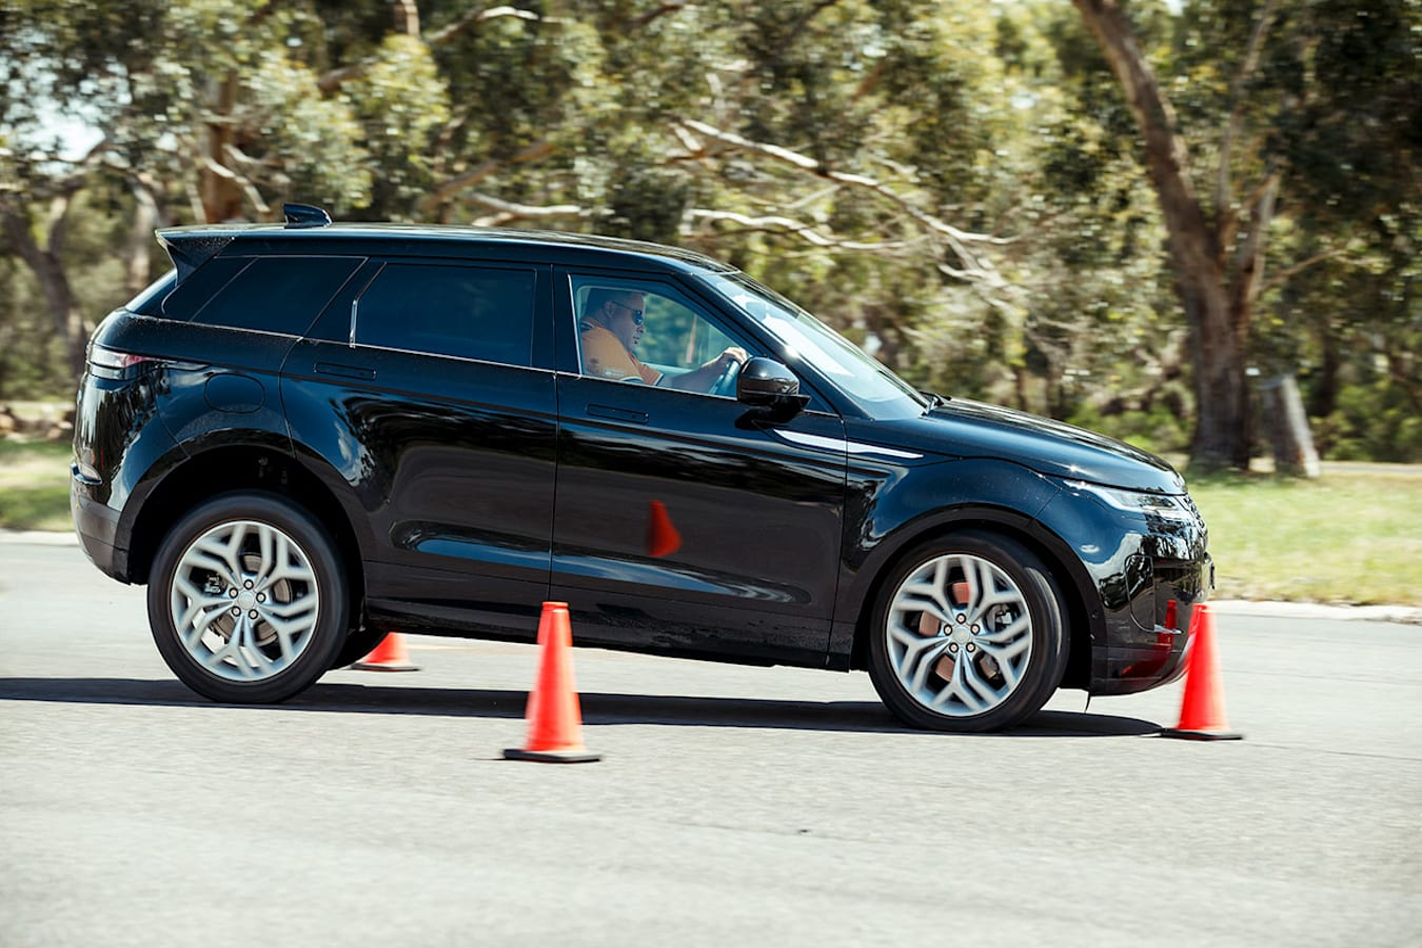 Range Rover Evoque - 2020 COTY Contender